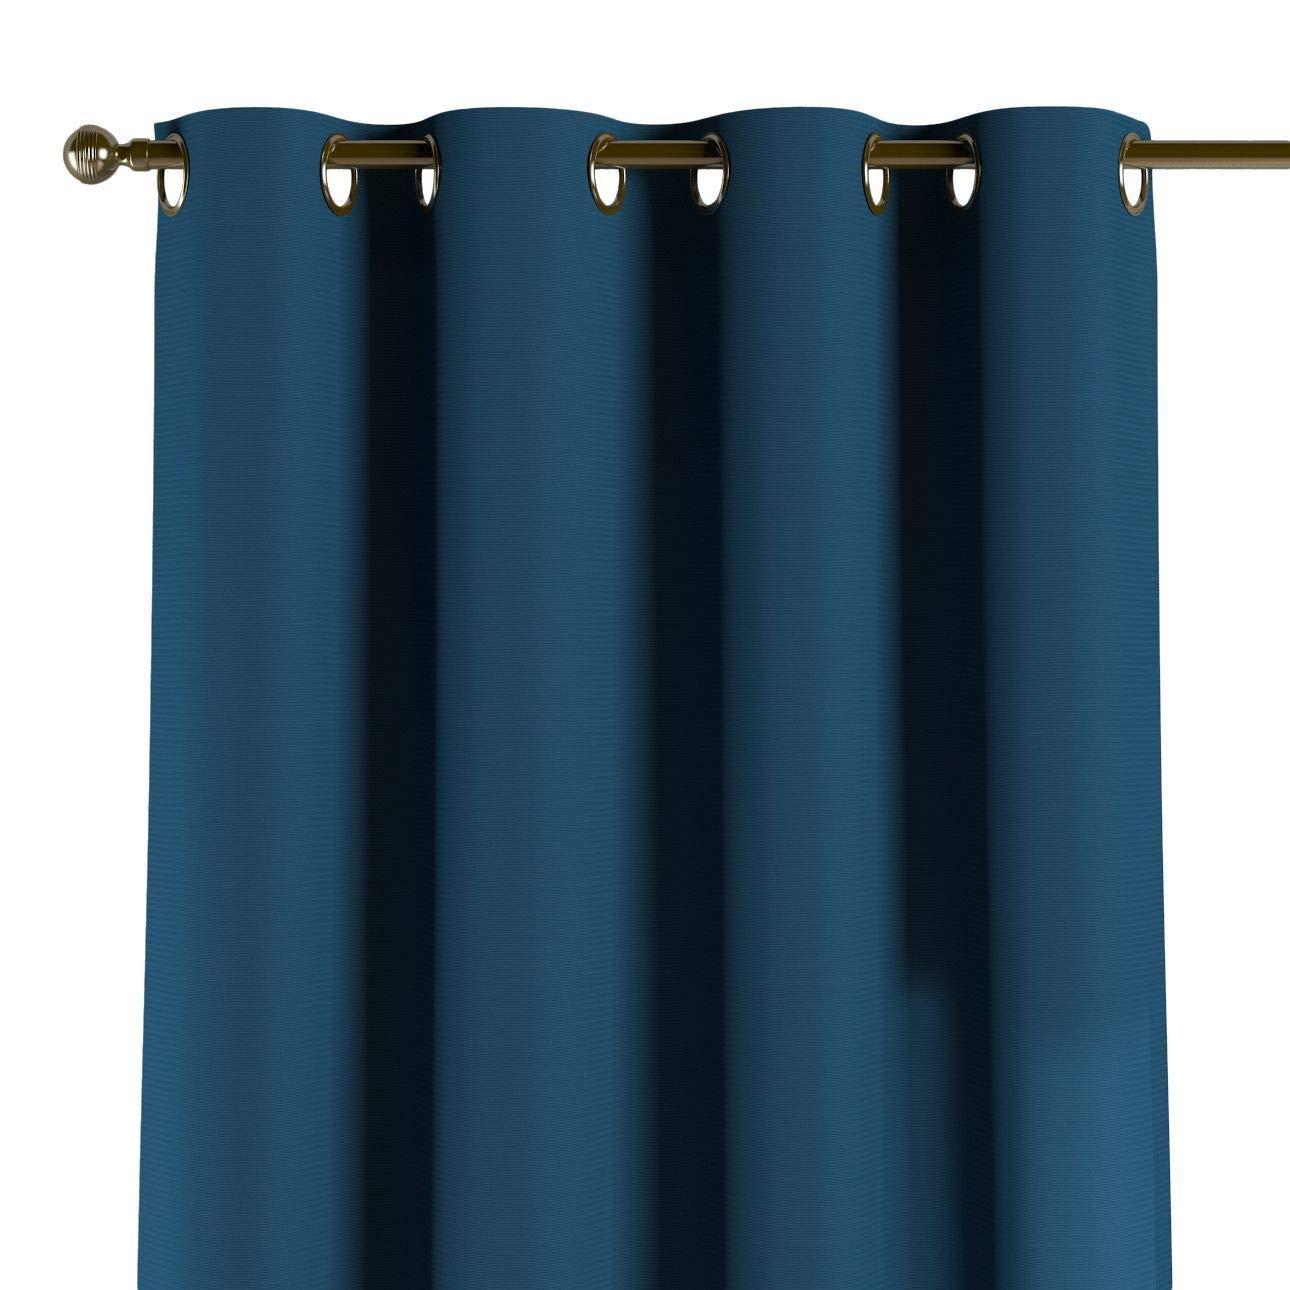 Dekoria Ösenschal Dekoschal Blickdicht 1 Stck. 130 × 260 cm marinenblau Maßanfertigung möglich